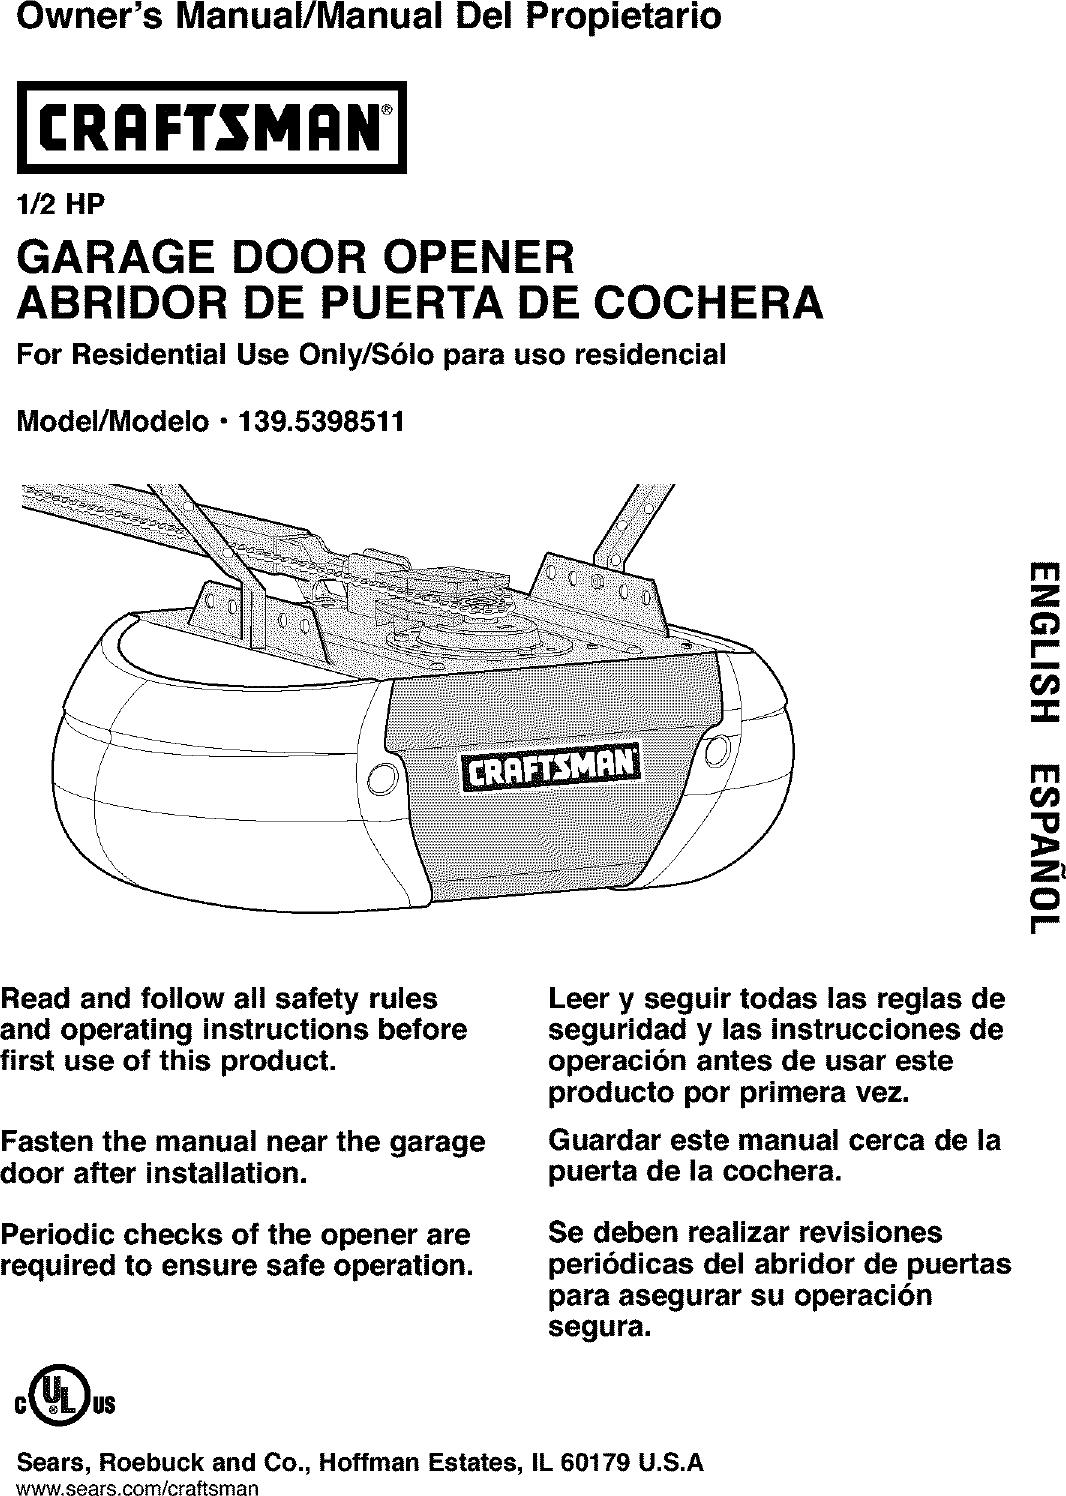 Craftsman 1395398511 User Manual Garage Door Opener Manuals And Wiring Diagram Besides Guides L0403216